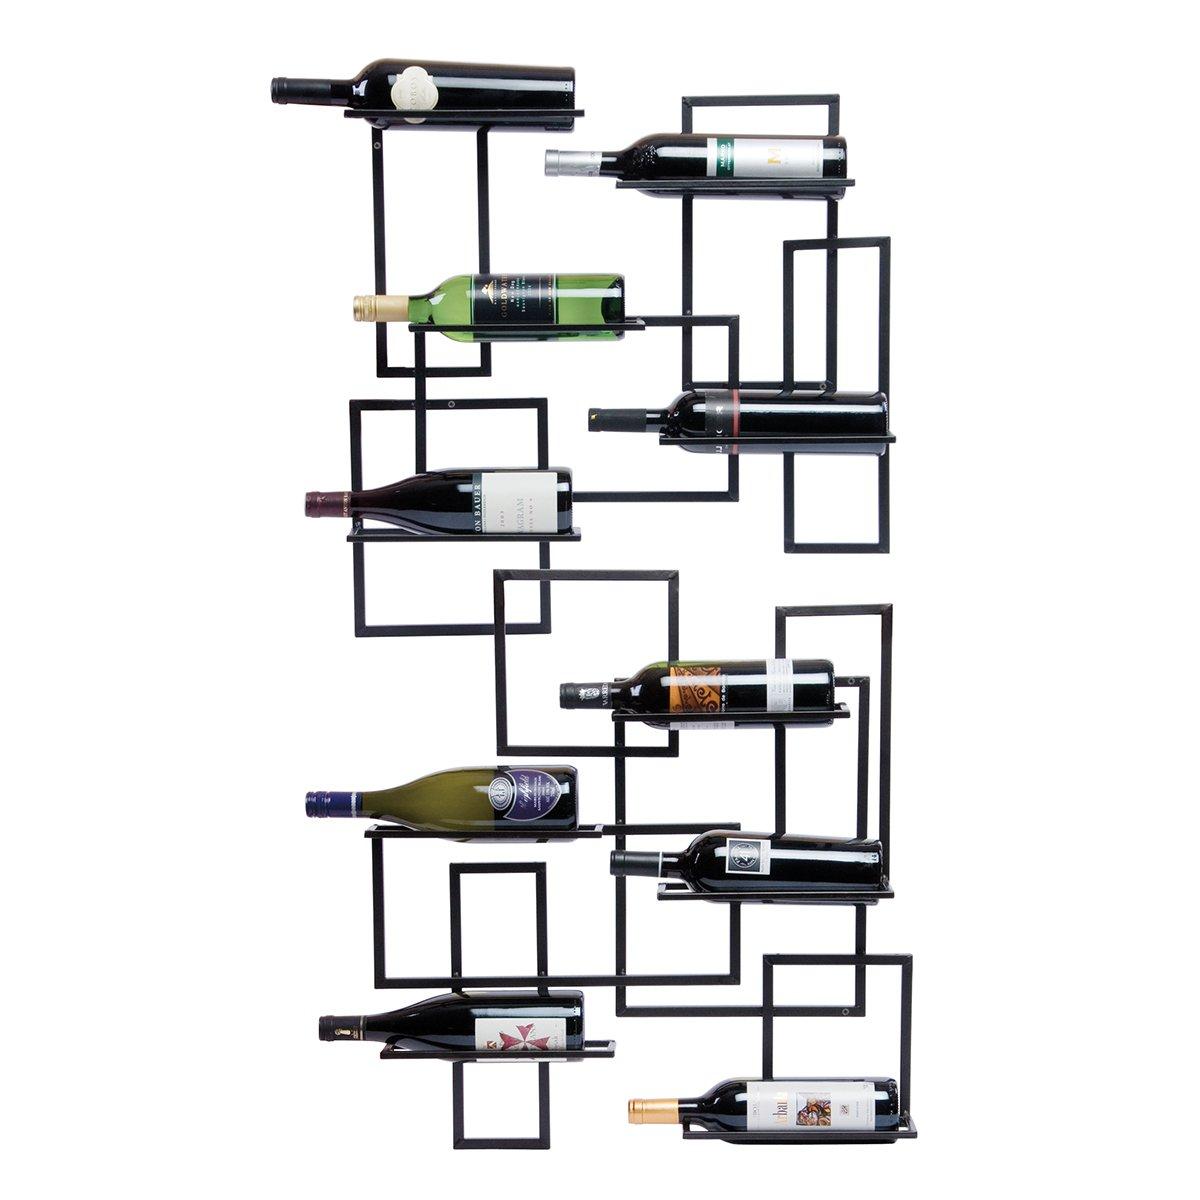 Oenophilia Mid Century Wall Mount Wine Rack - 10 Bottle by Oenophilia (Image #3)